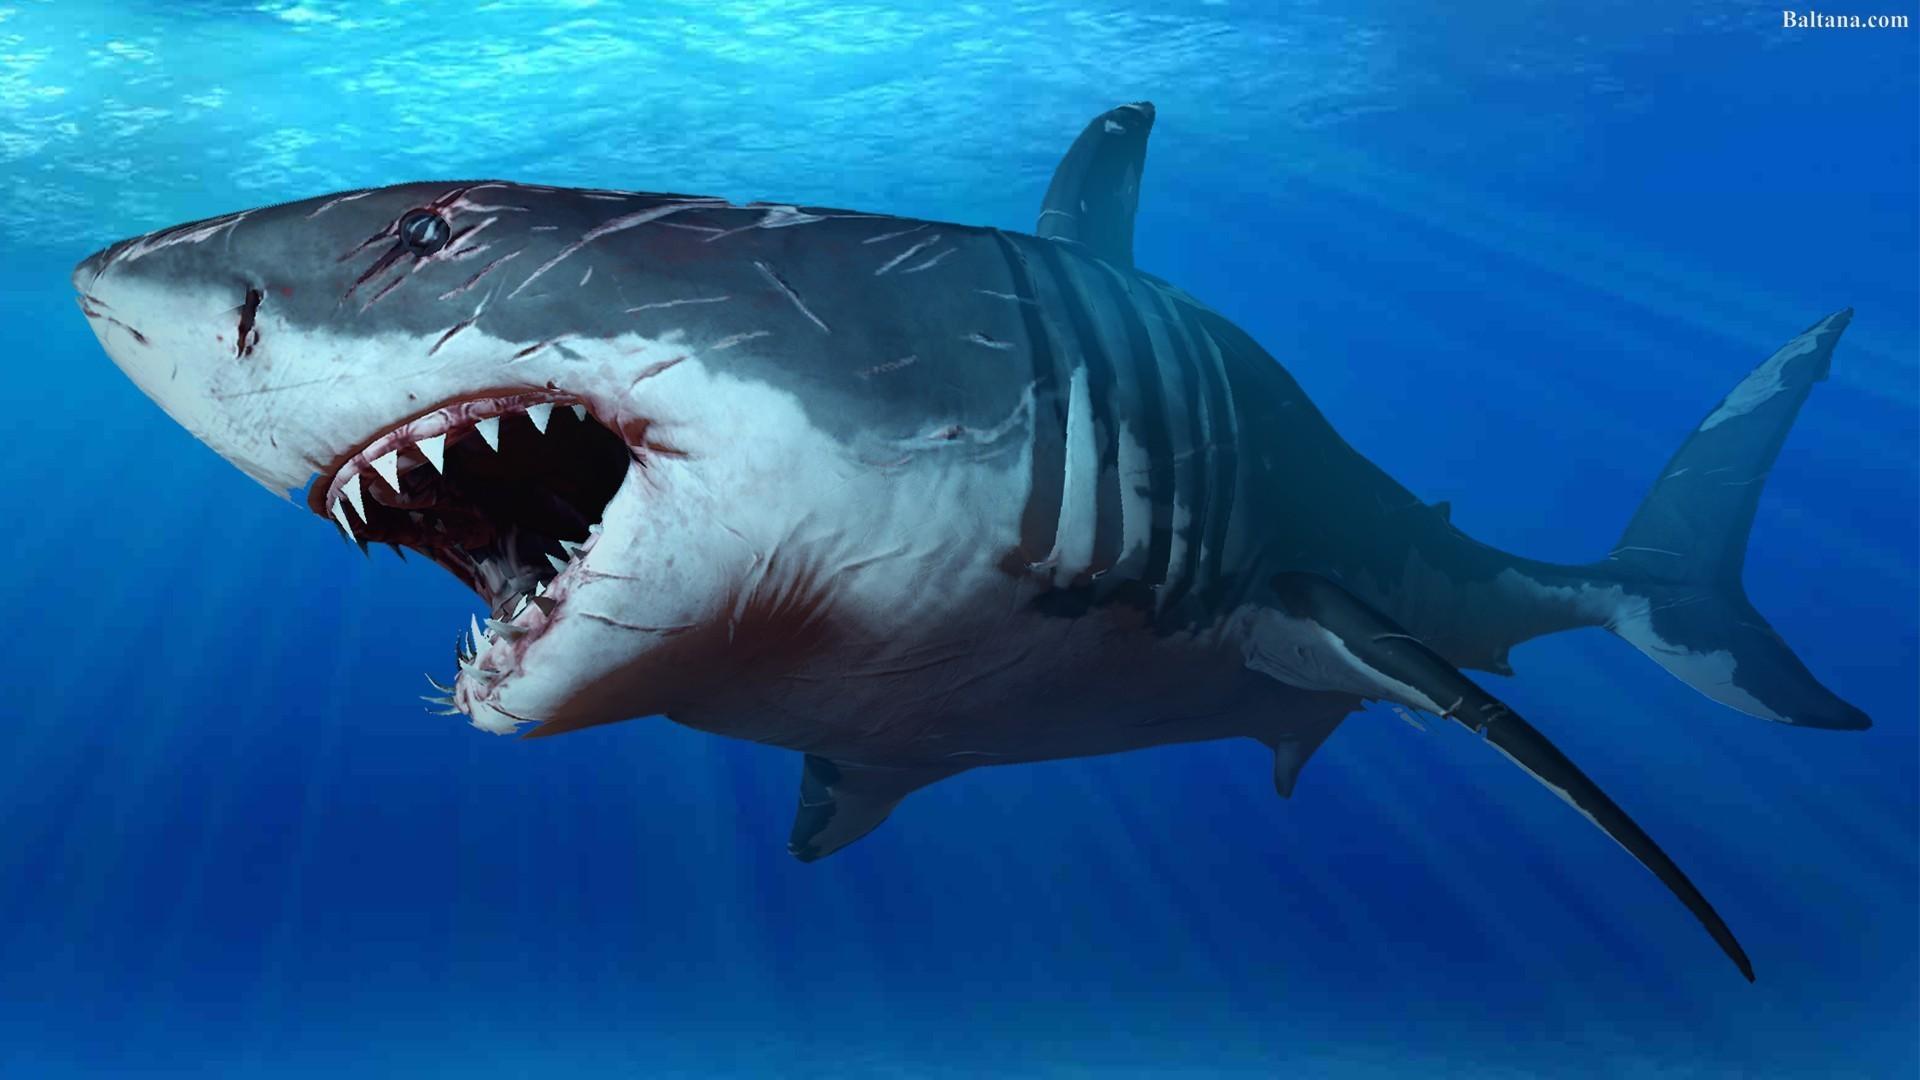 Shark Wallpaper 71 Images